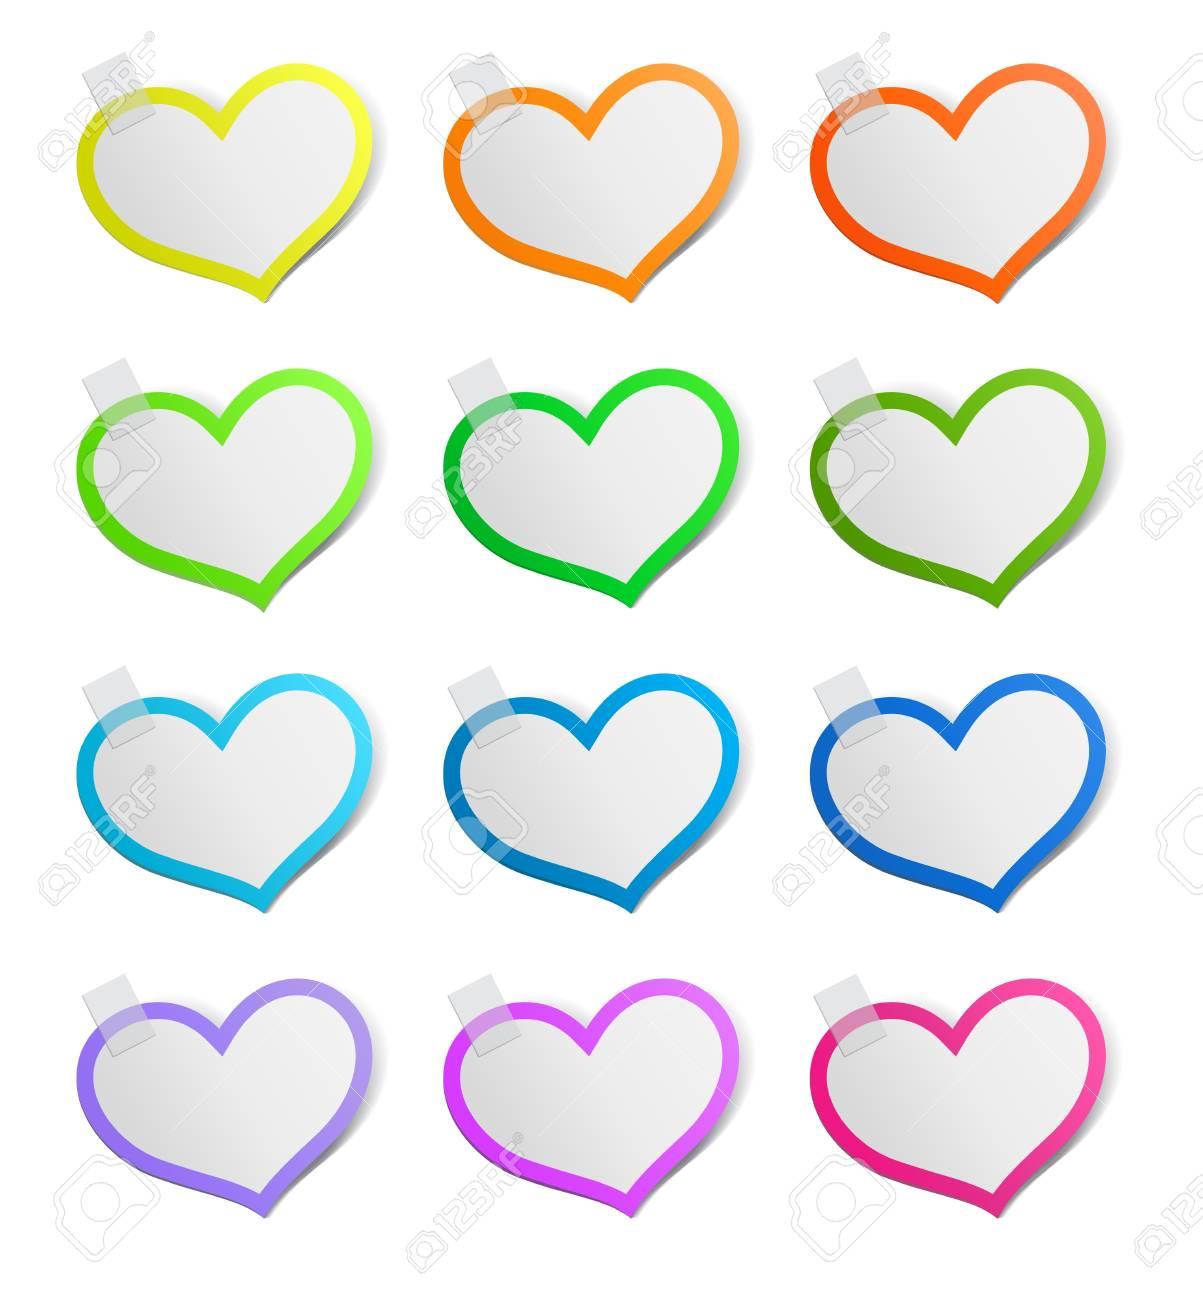 Heart shape stickers set, vector illustration Stock Vector - 17777159